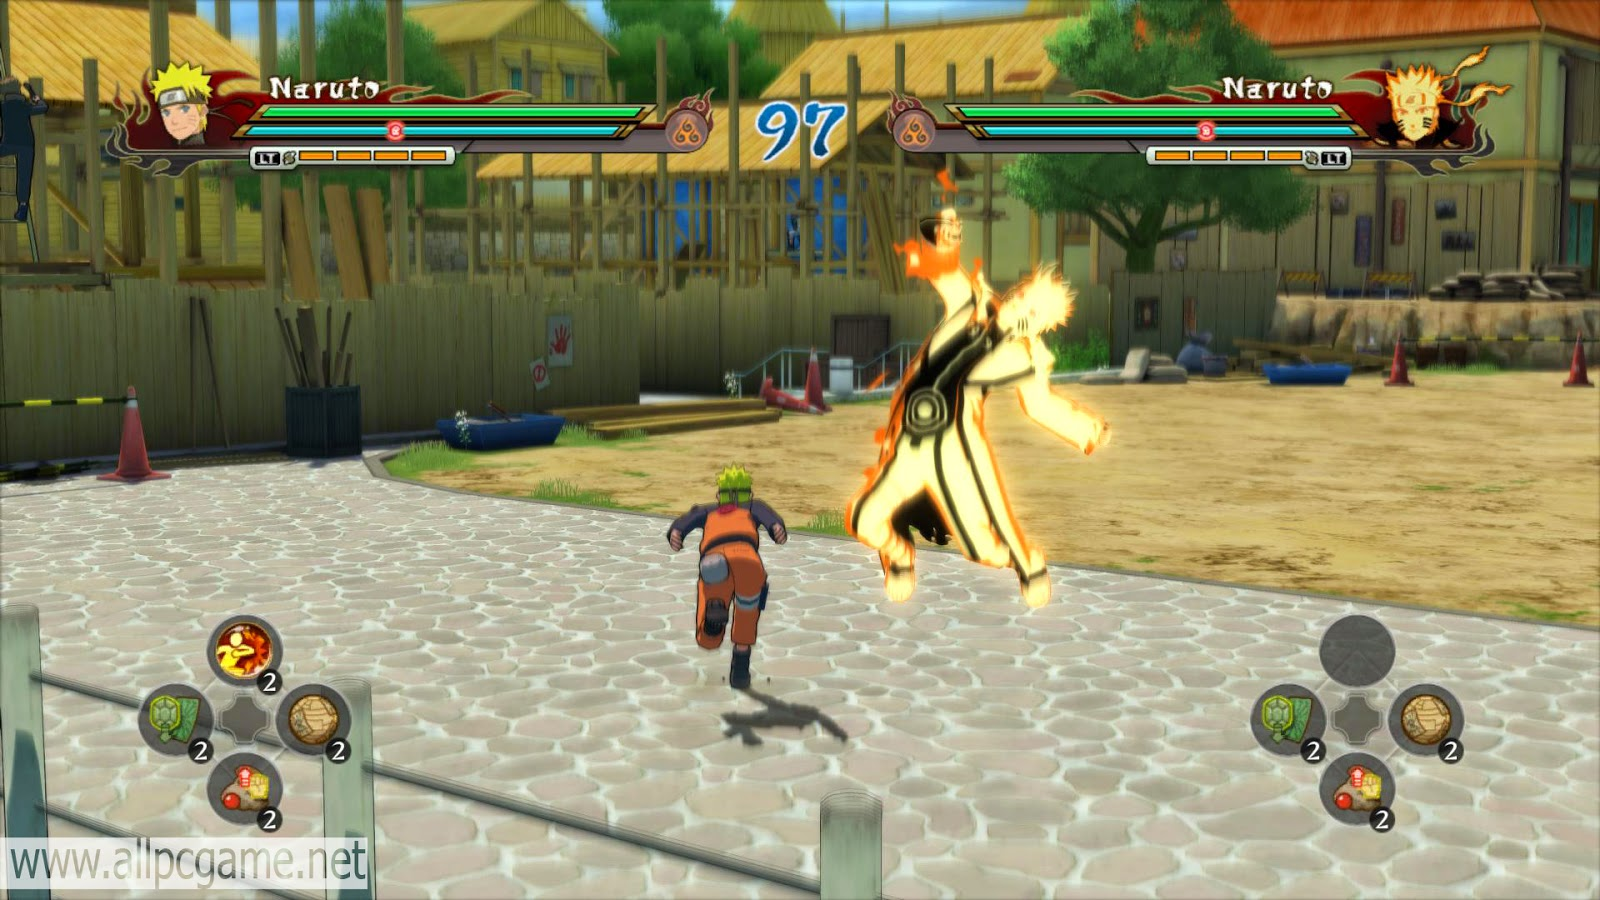 Naruto ultimate ninja storm 3 date release